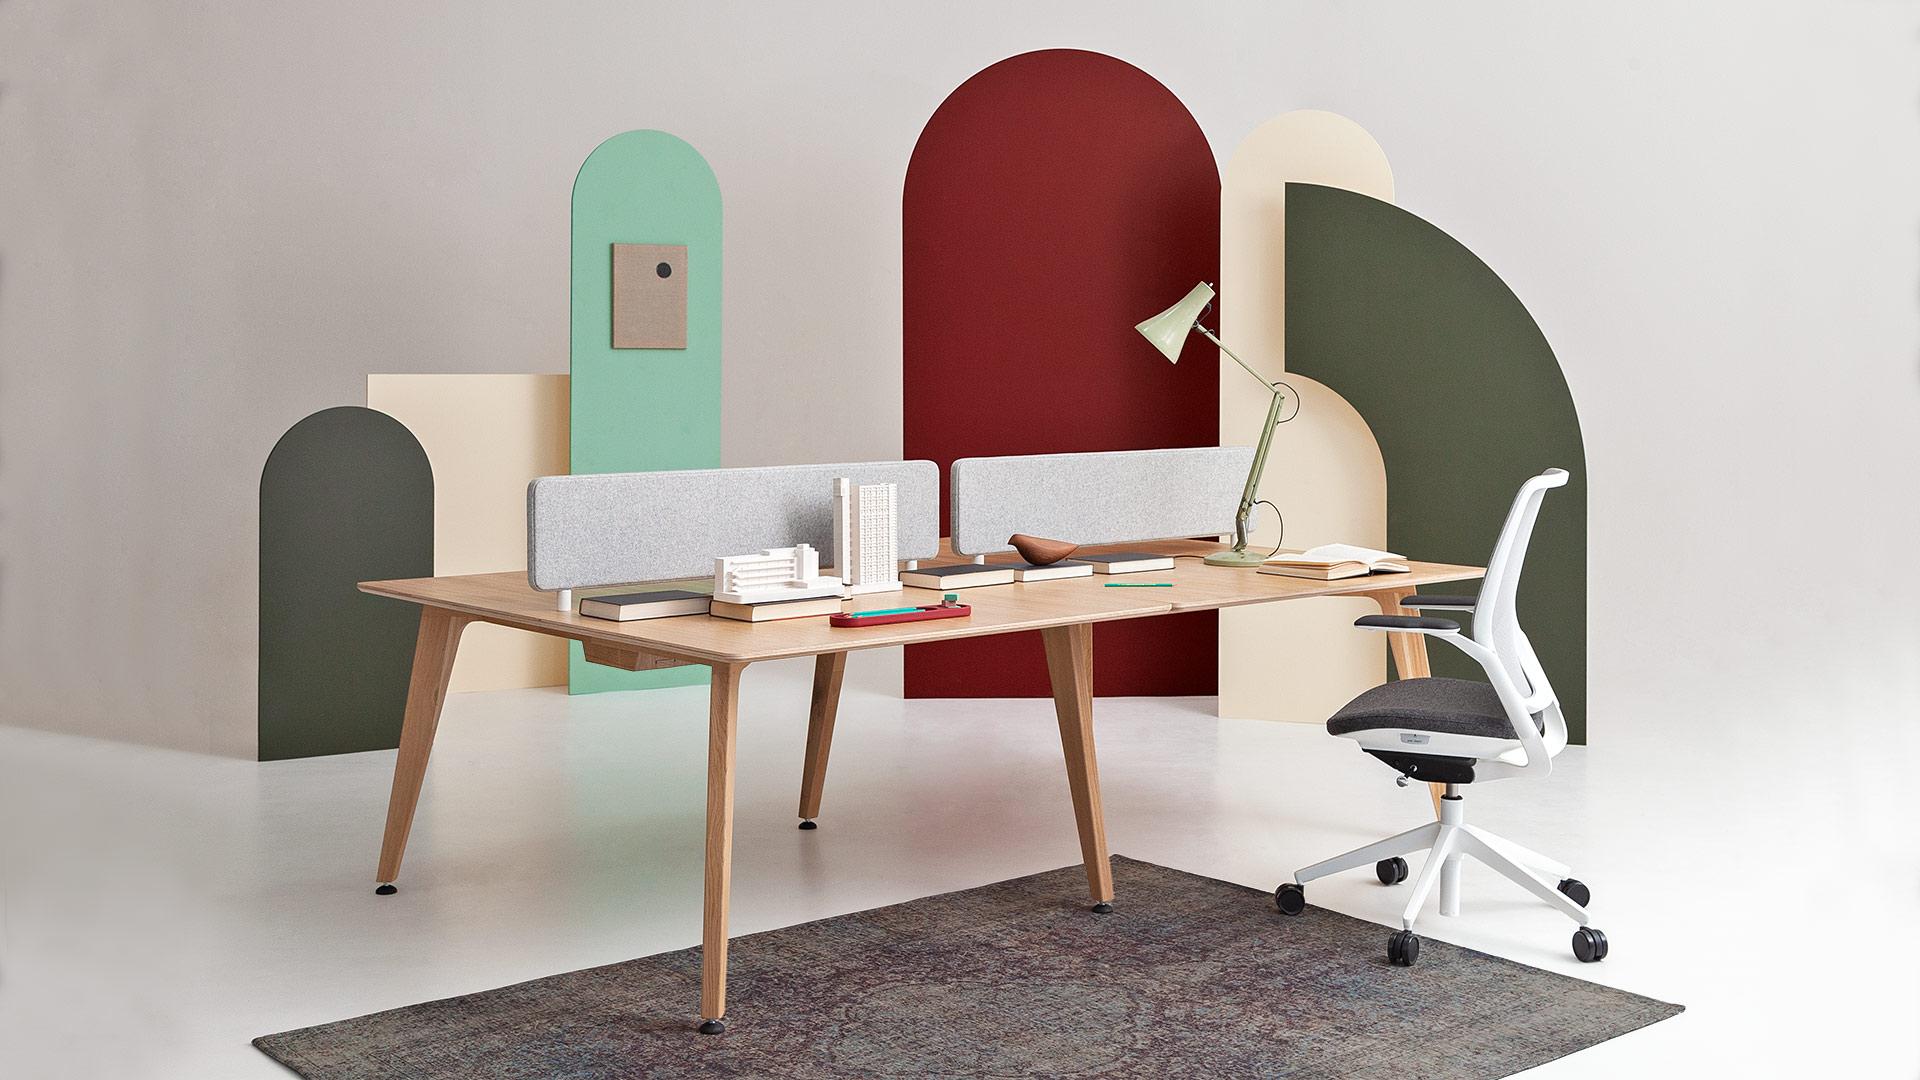 Bench Desk | Office Desk | Desk Benches | Bench Style Desks | British Made